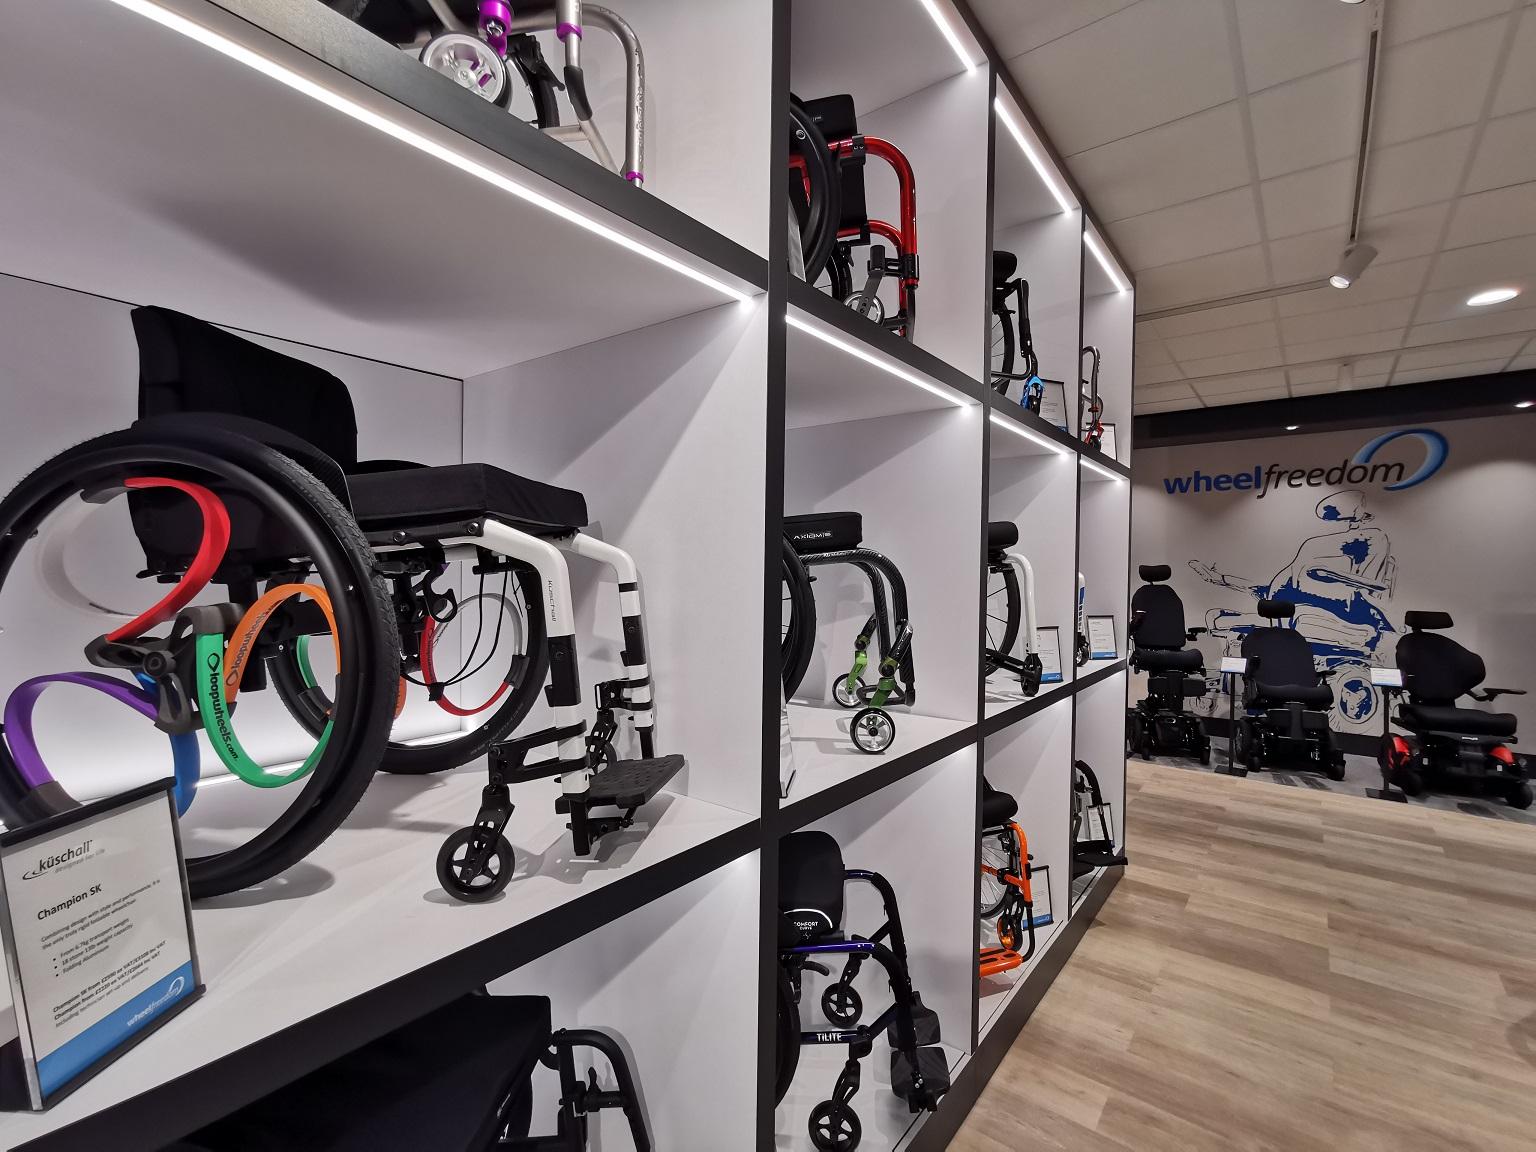 WheelFreedom Showroom2